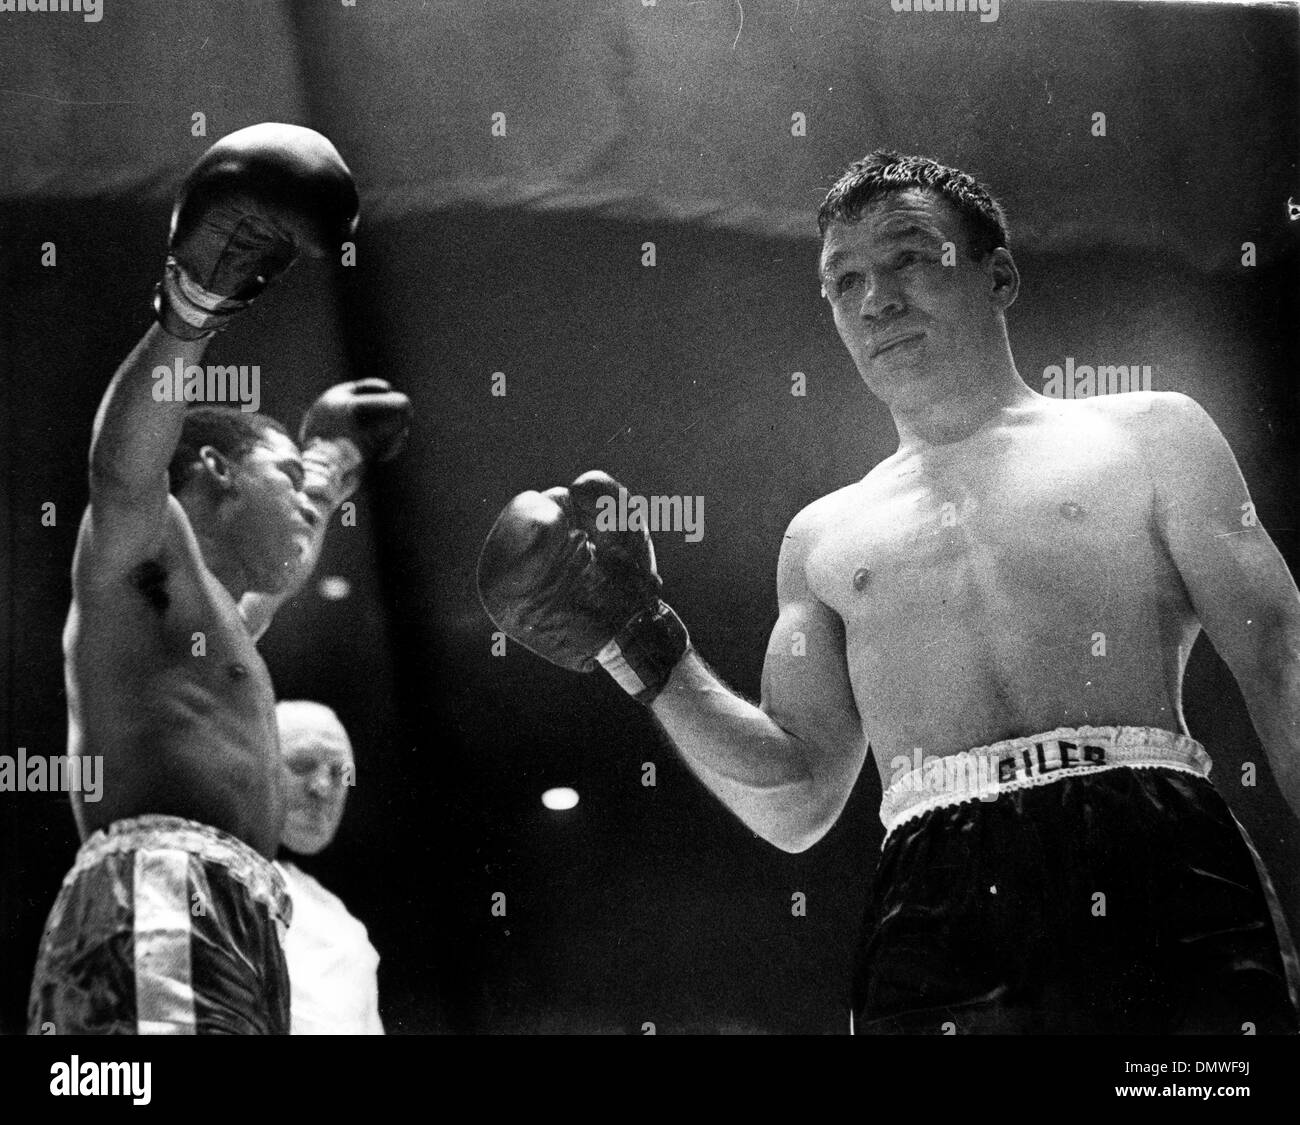 Junio 5, 1962 - Londres, Inglaterra, Reino Unido - DAVE CHARNLEY era un boxeador ligero en inglés. Conocido como Foto de stock